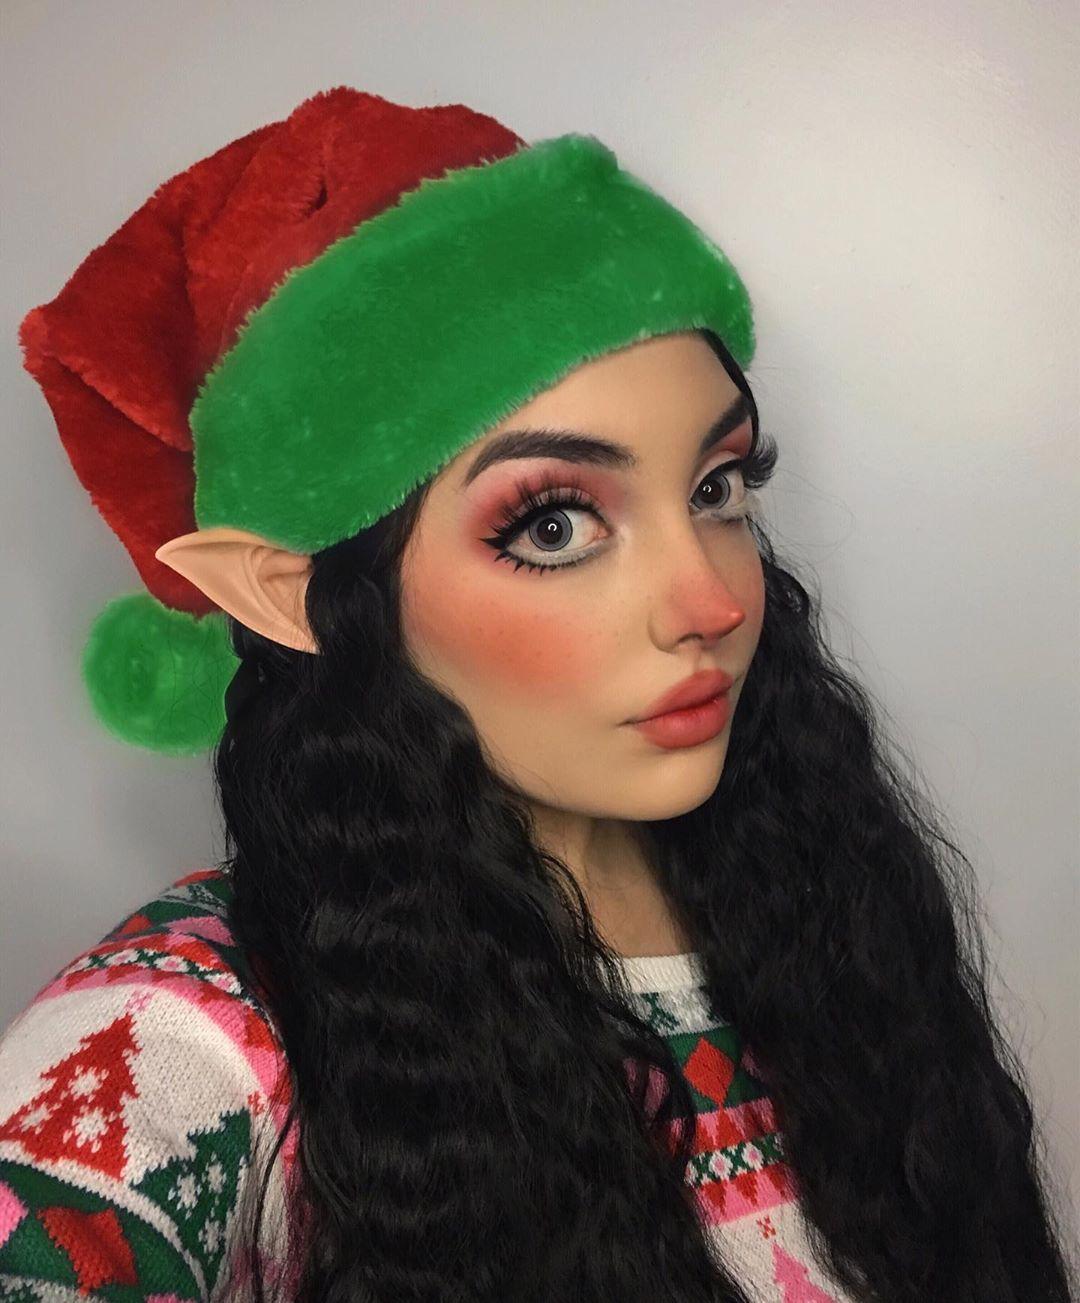 Magic Grey Colored Contact Lenses Christmas elf makeup